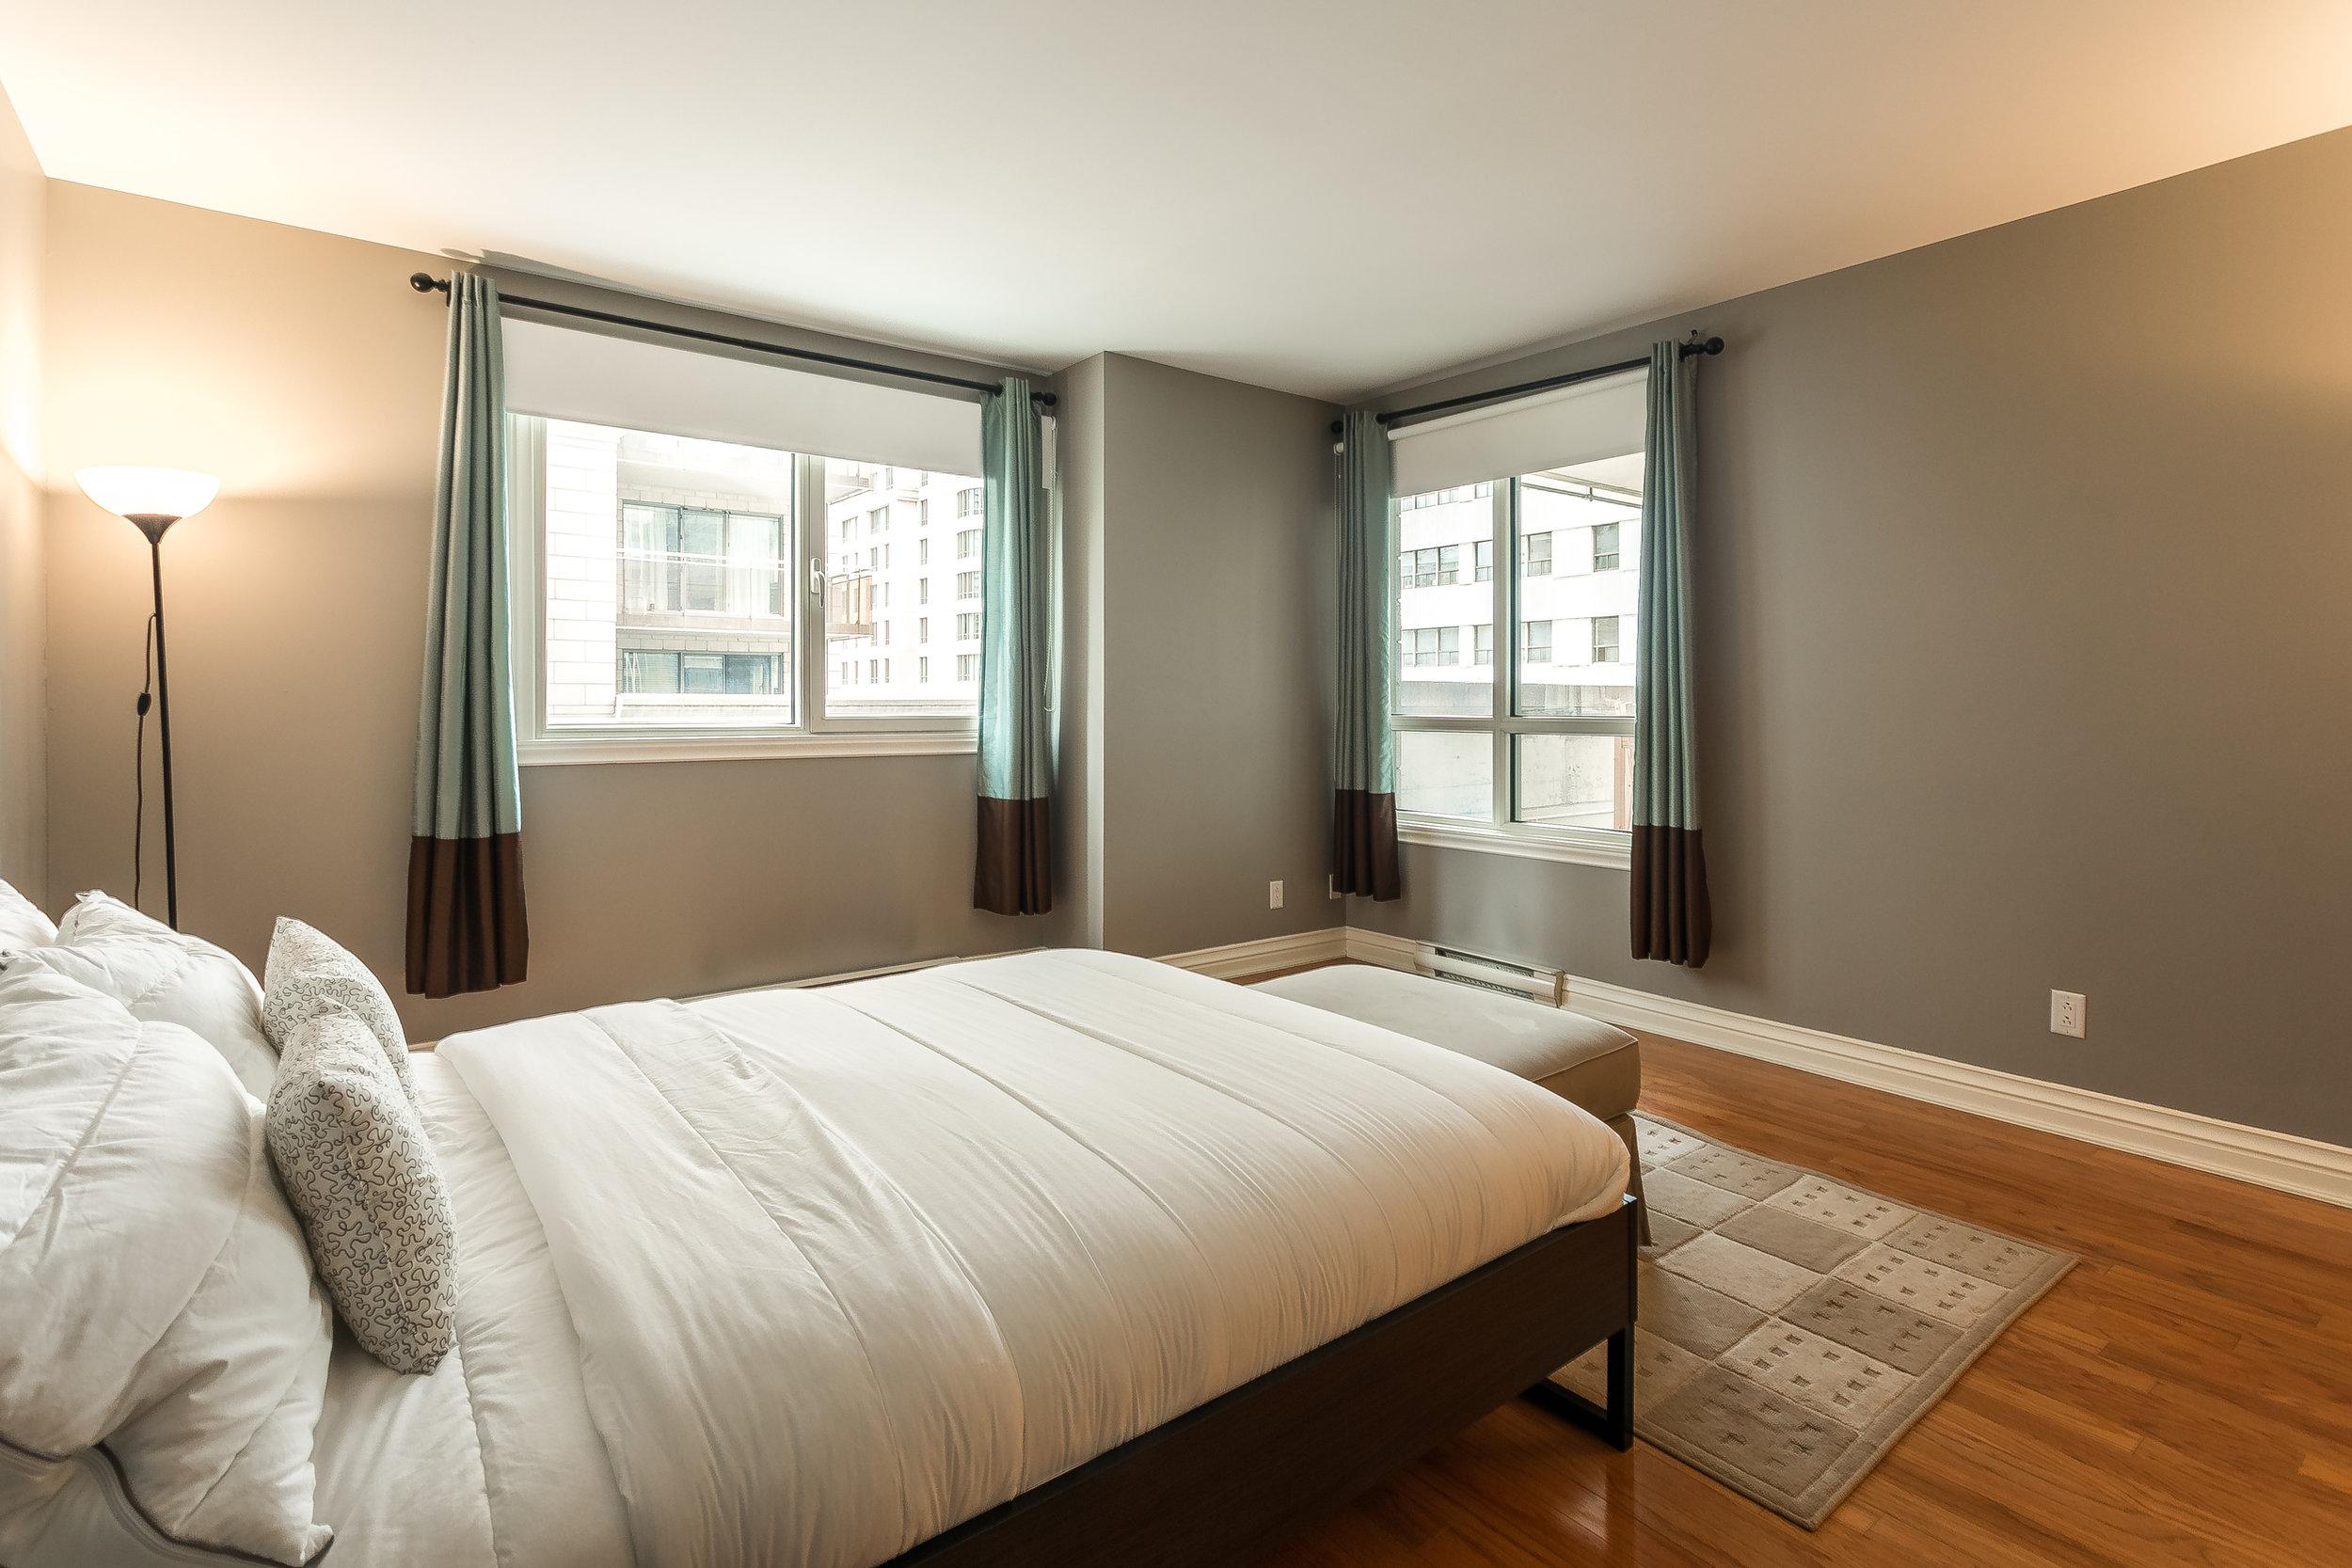 1200 bedroom 1 (1 of 1).jpg